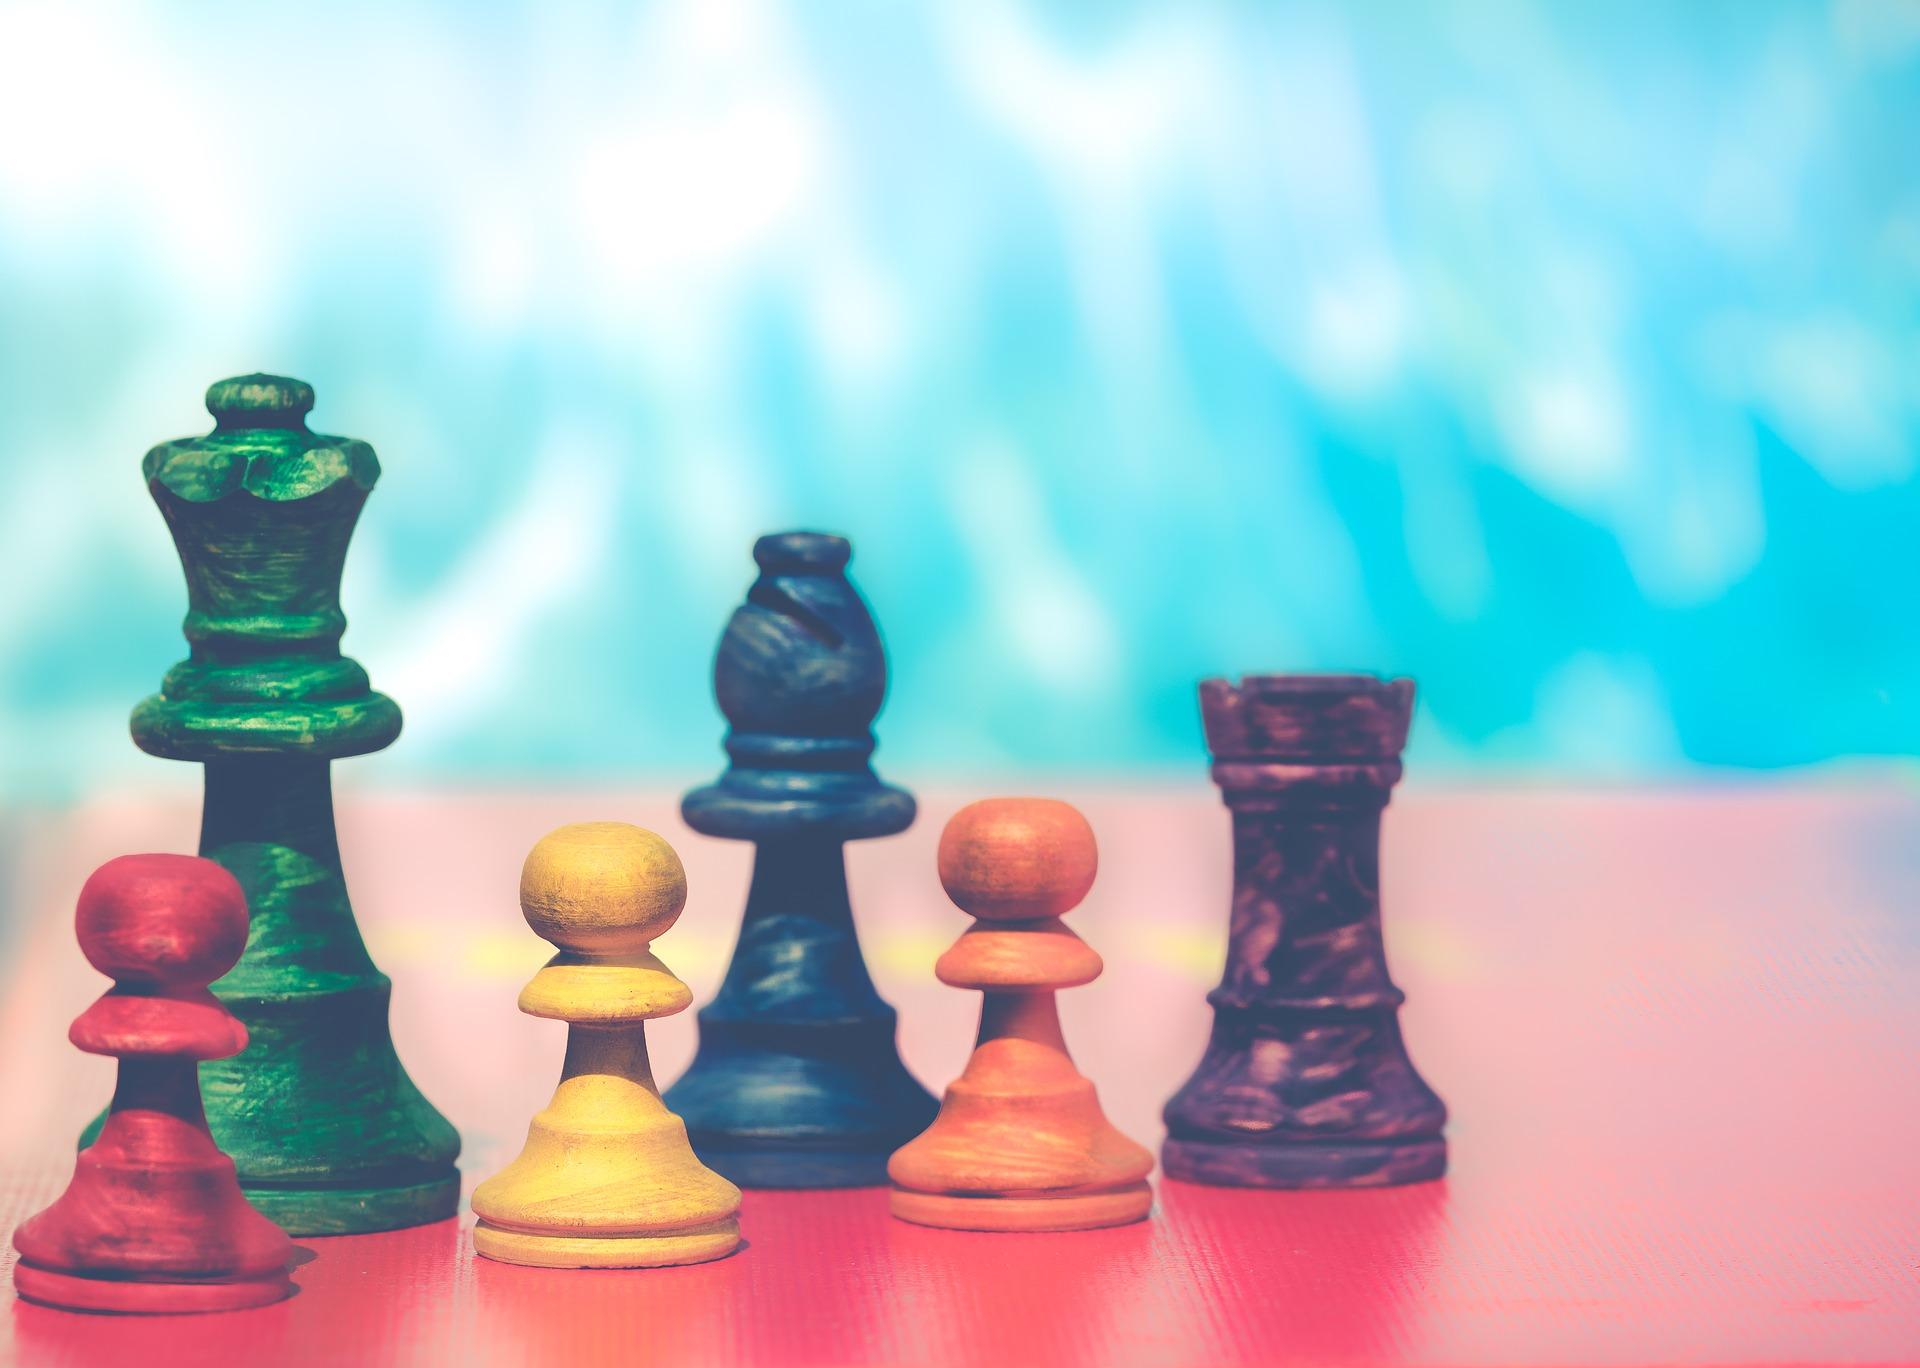 pawns-3467512_1920.jpg